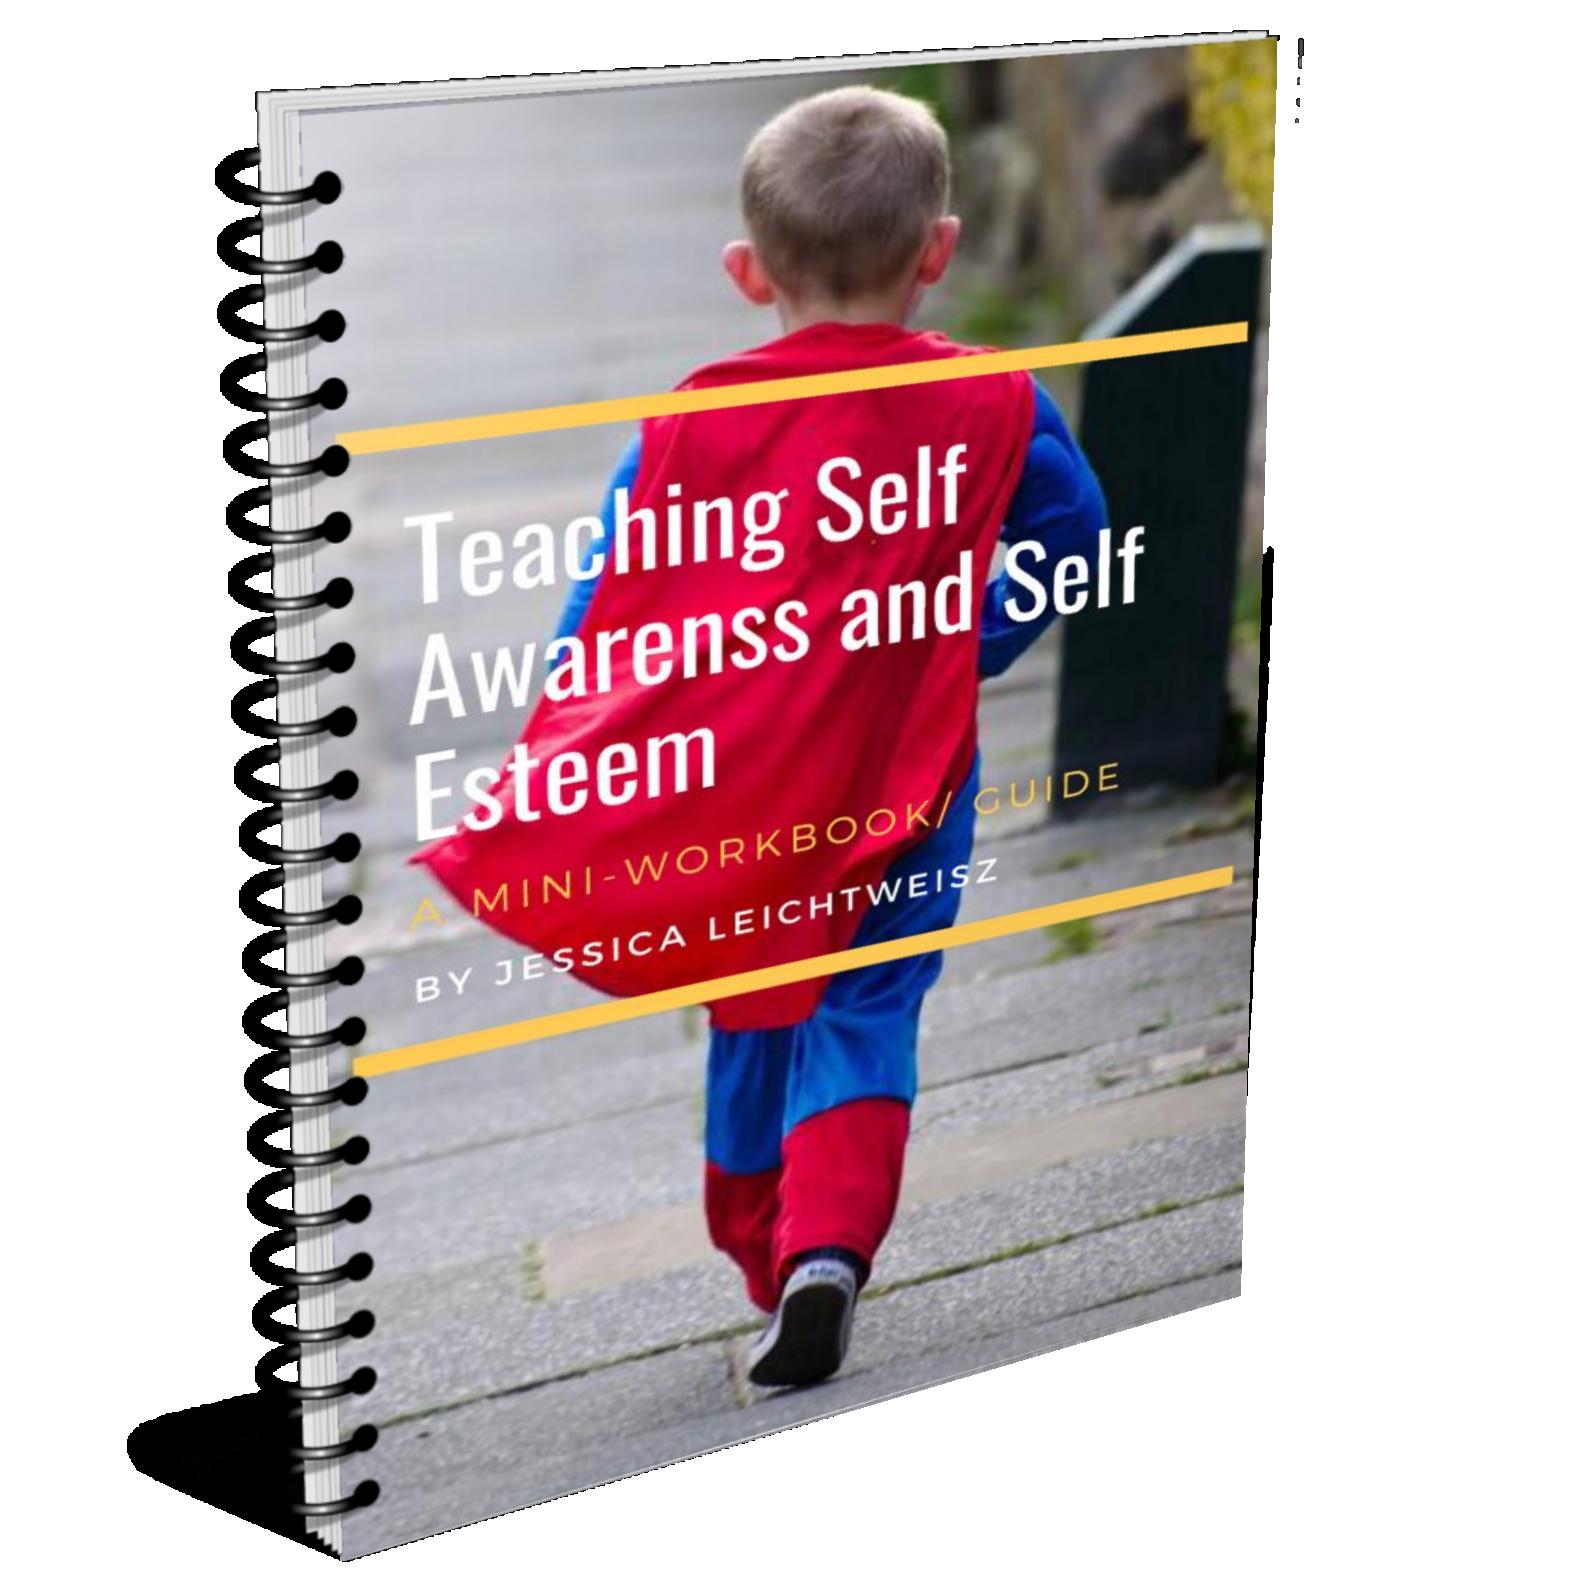 Teaching Self Awareness and Self Esteem